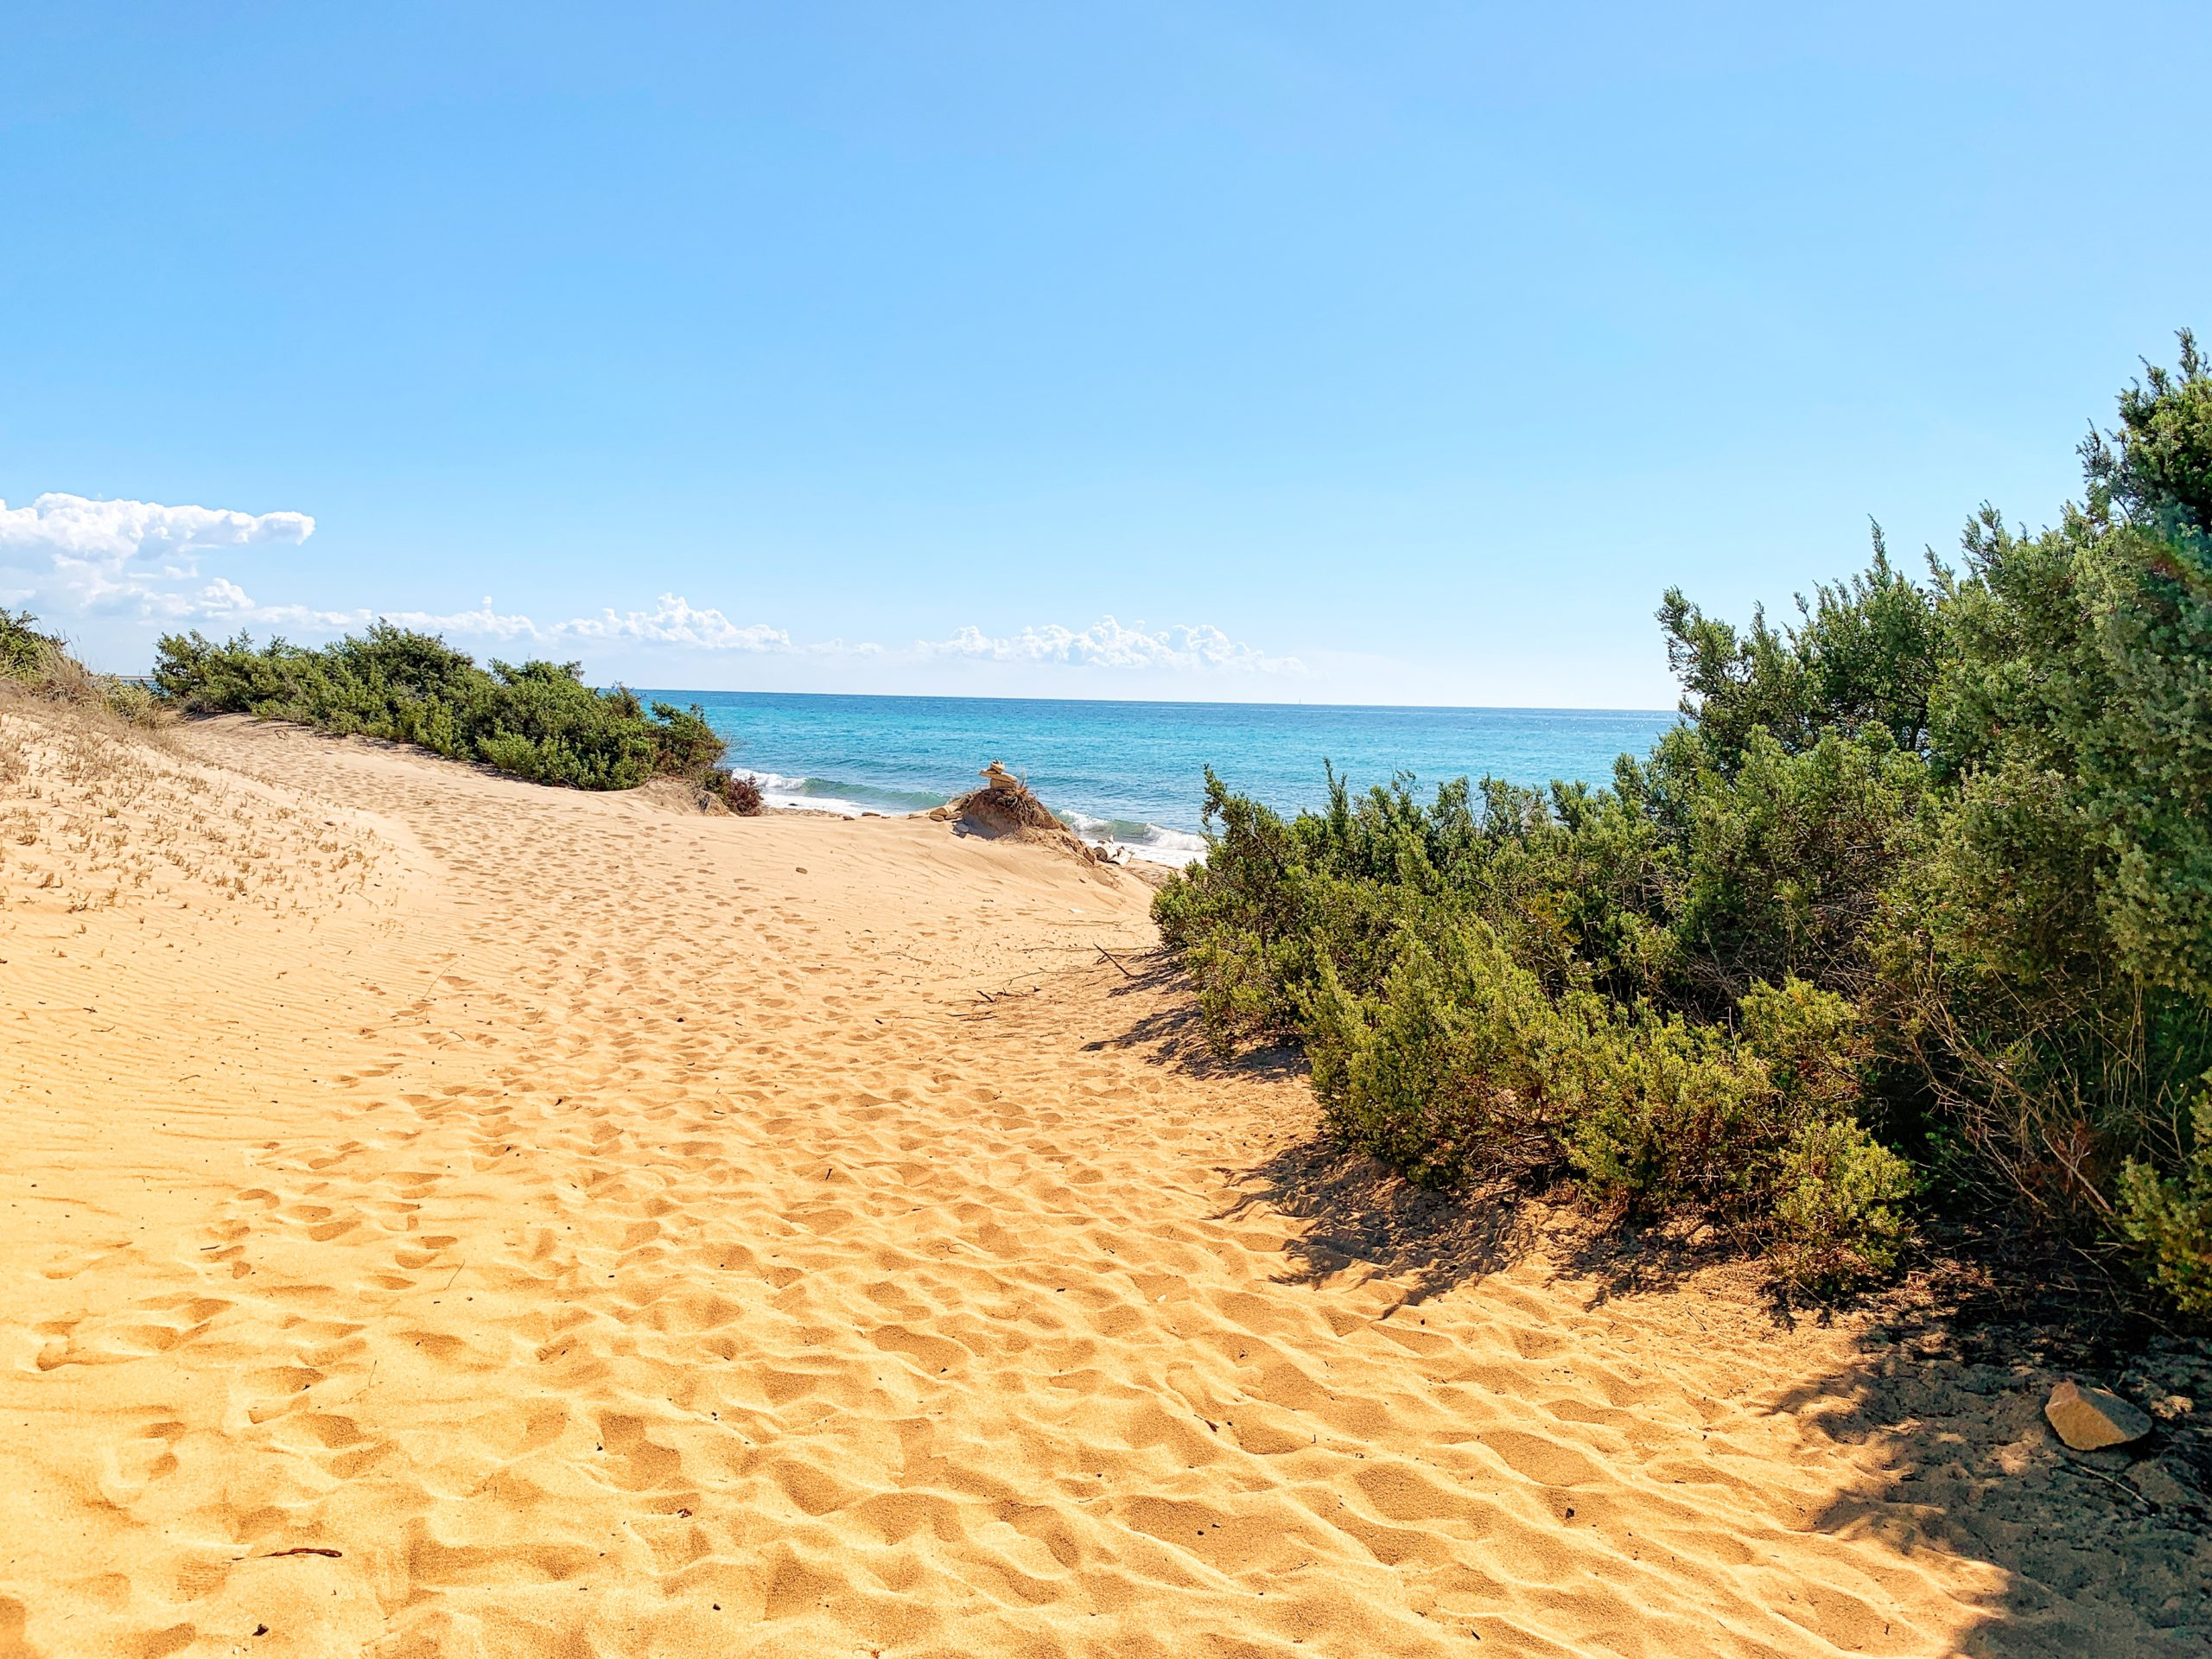 D'Ayala beach in Campomarino, Puglia's top gay beach